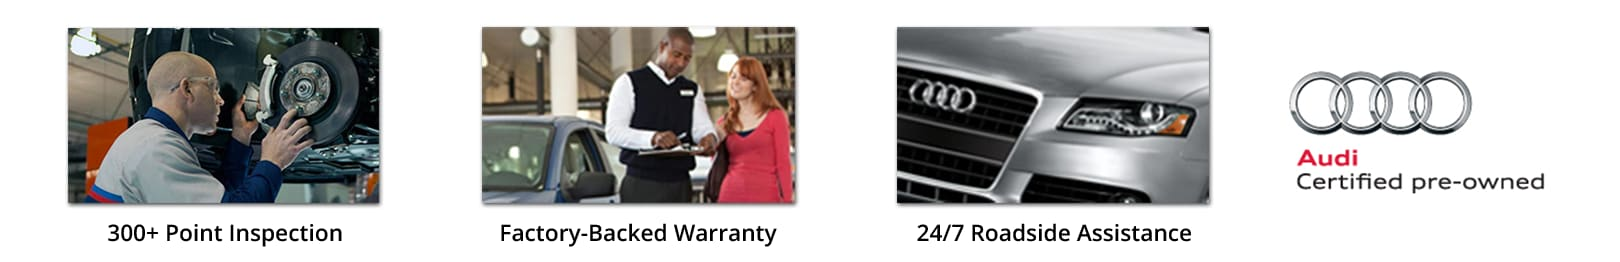 Audi Grand Rapids Vehicles For Sale In Grand Rapids MI - Audi grand rapids